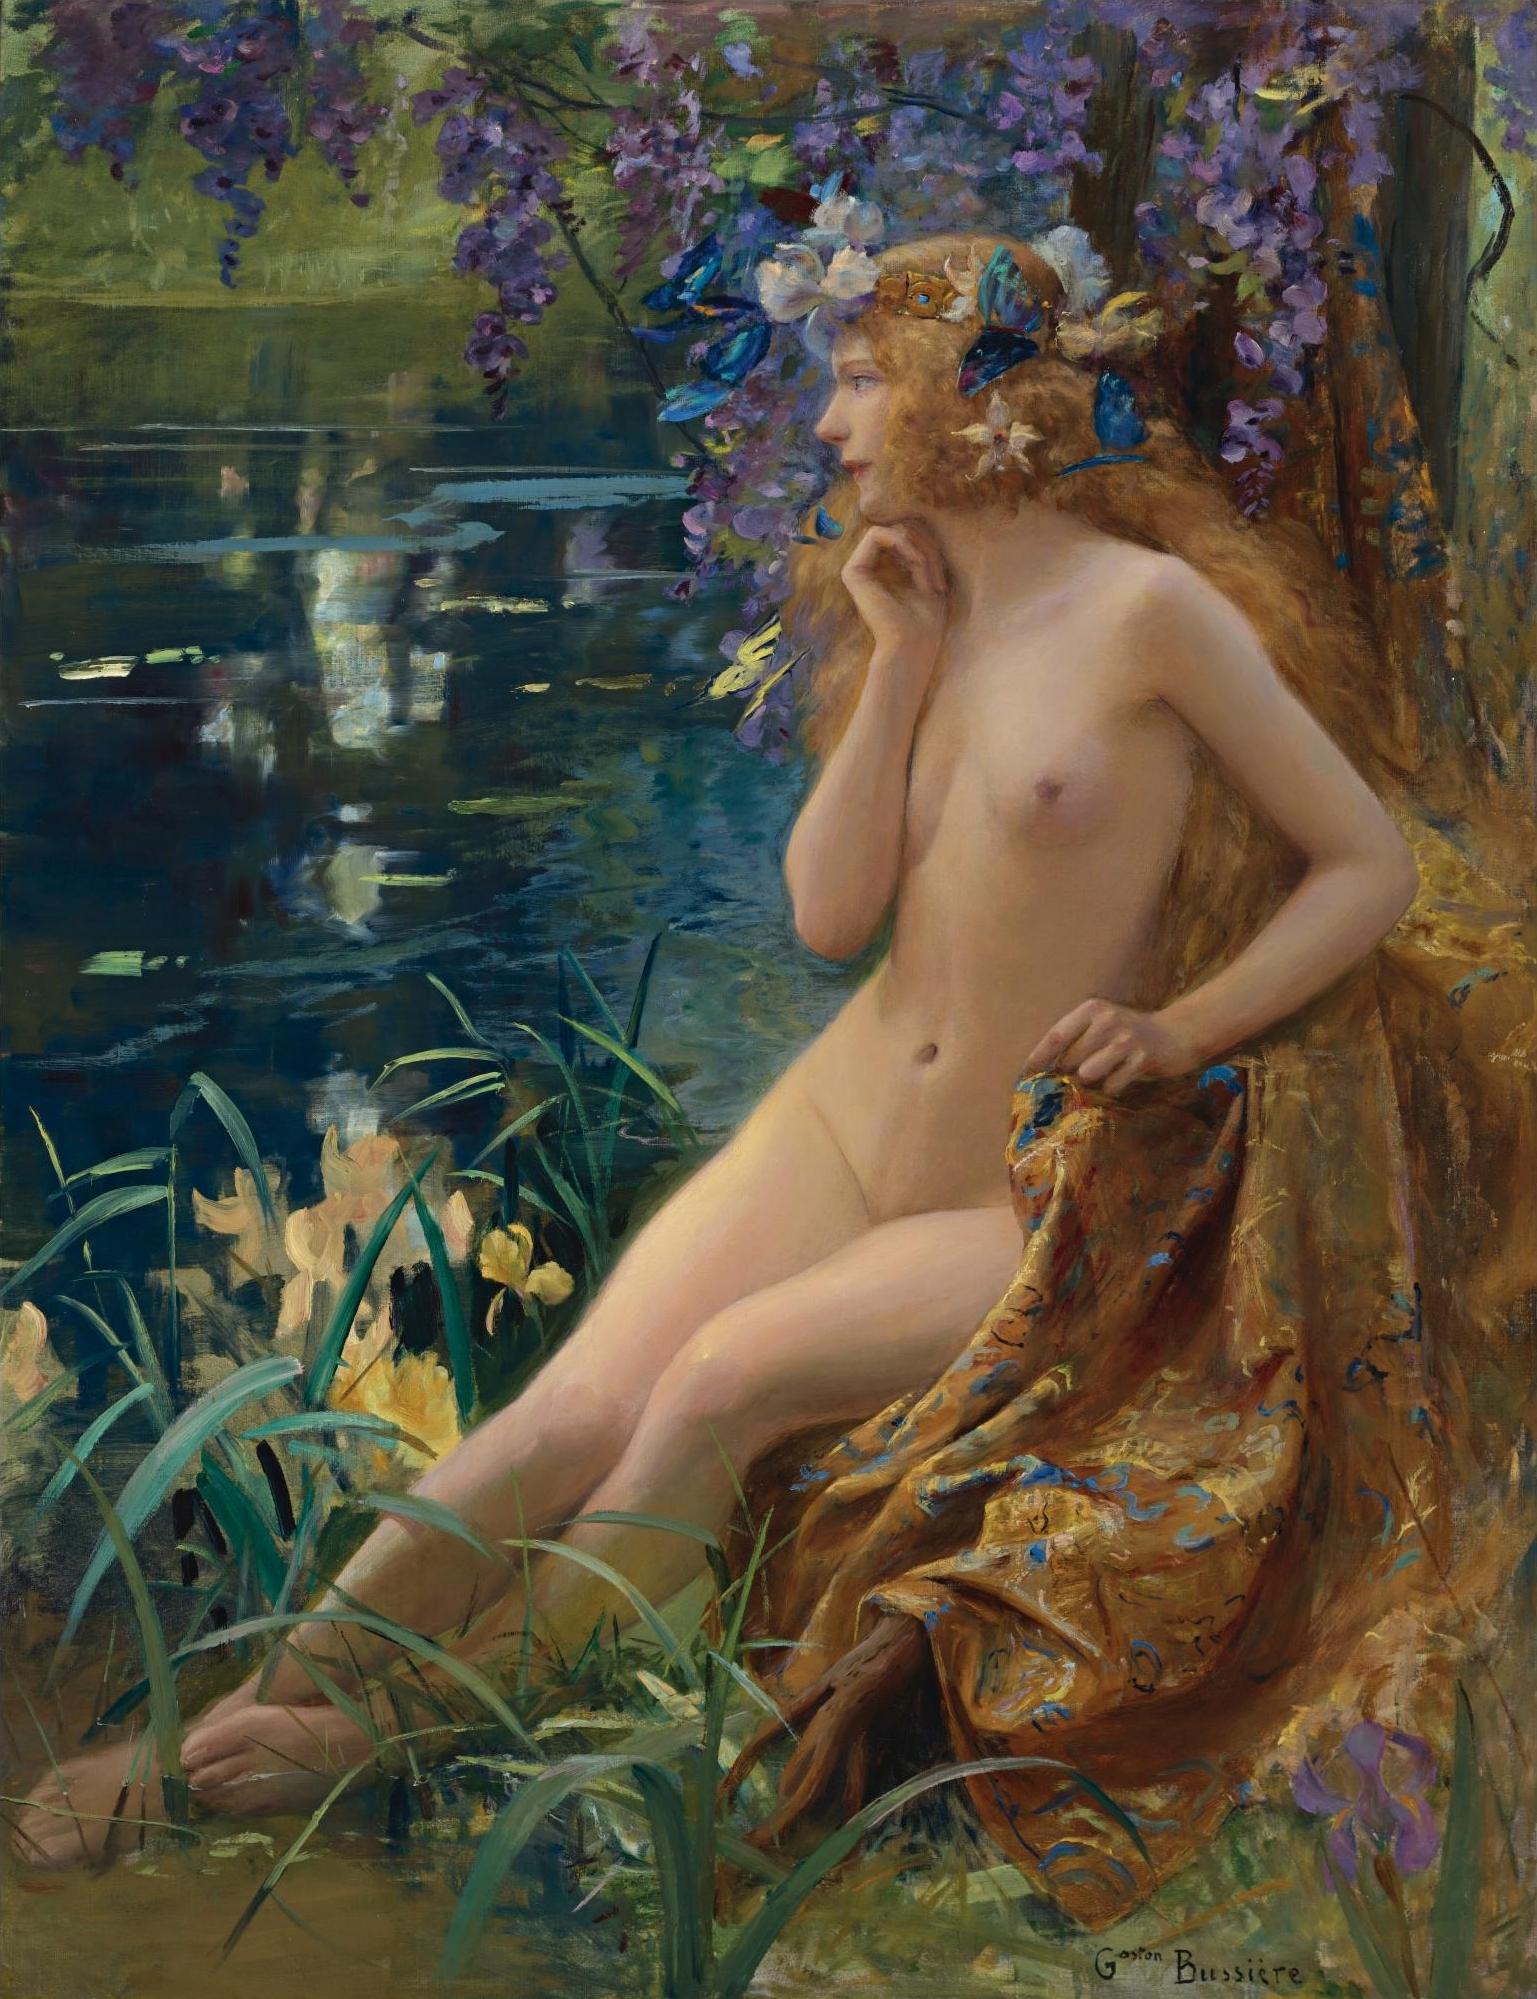 Gaston Bussiere, 1862-1928. Ювента (богиня юности). 146.7 х 114.3 см. Частная коллекция